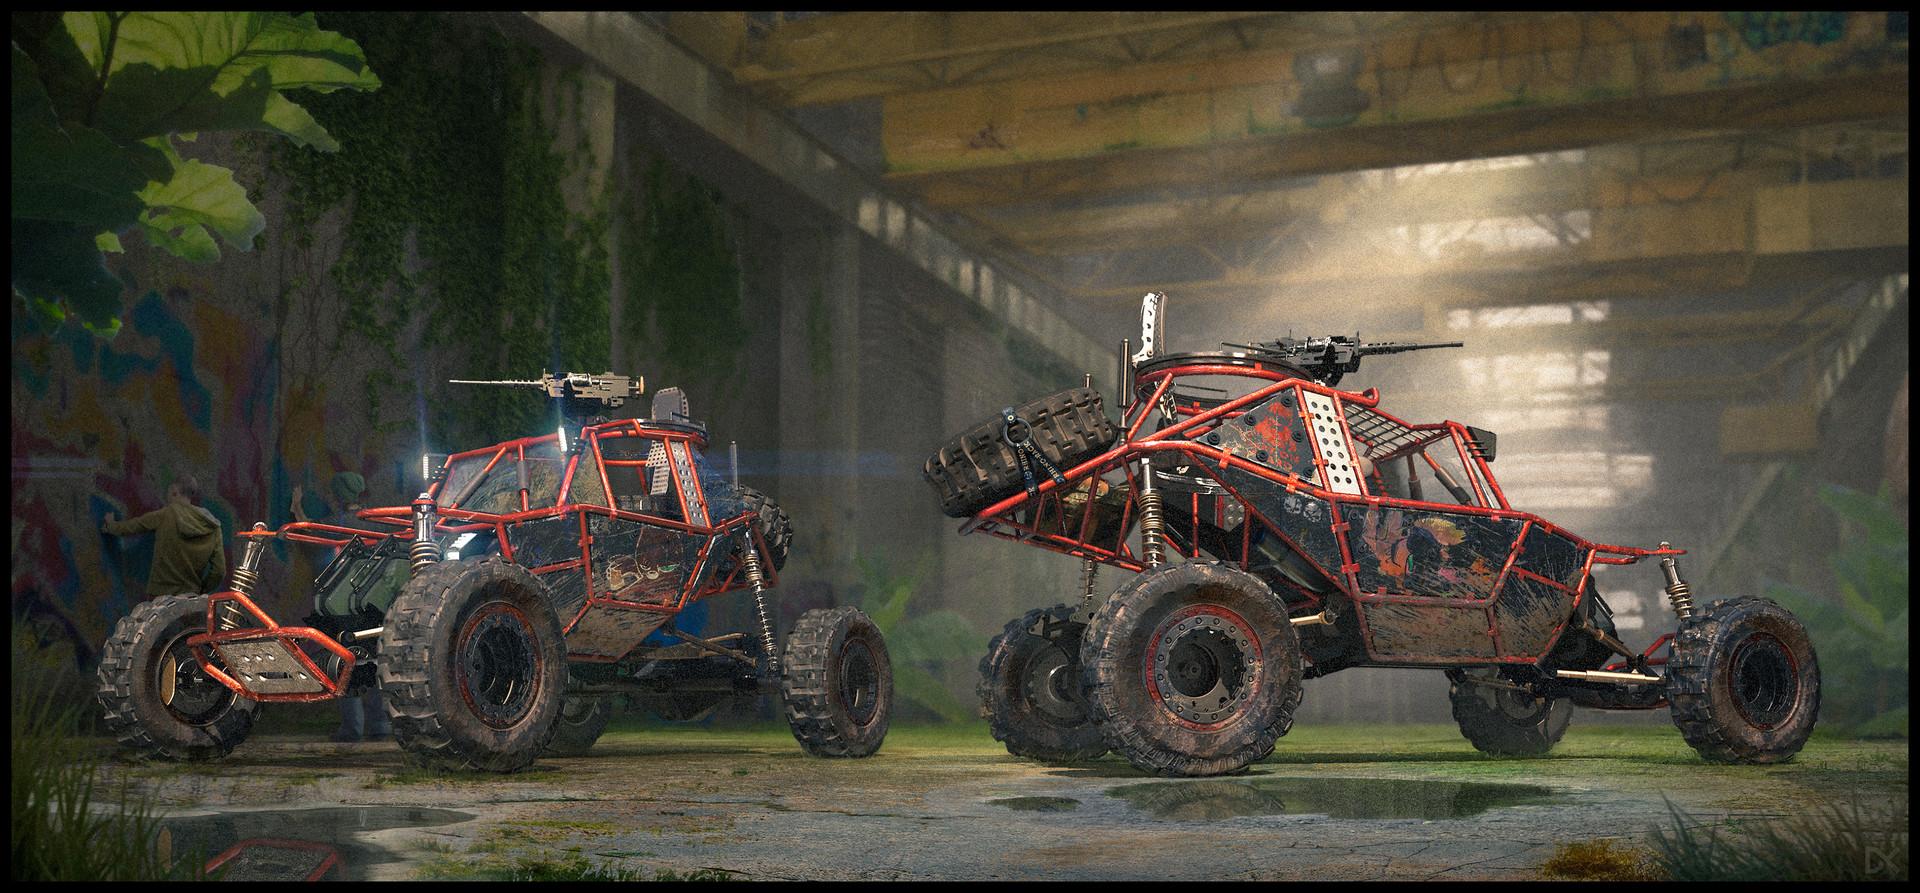 Darius kalinauskas buggy jungle abandoned concept art environment 4k